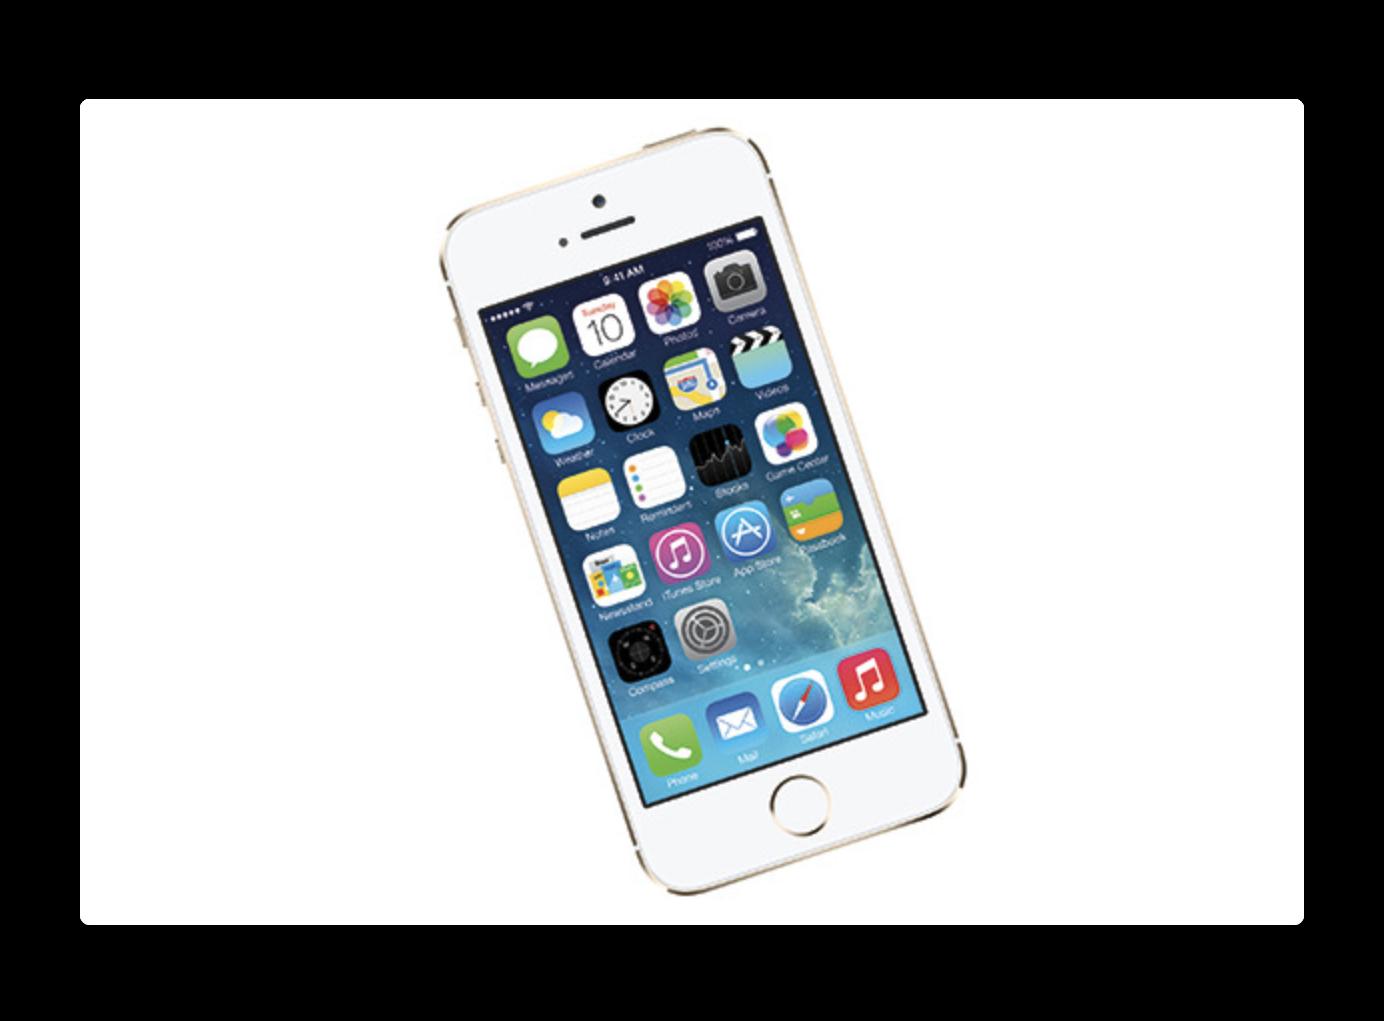 WebKitの開発者からの報告で、次期 iOS 12はiPhone 5Sのサポートを継続